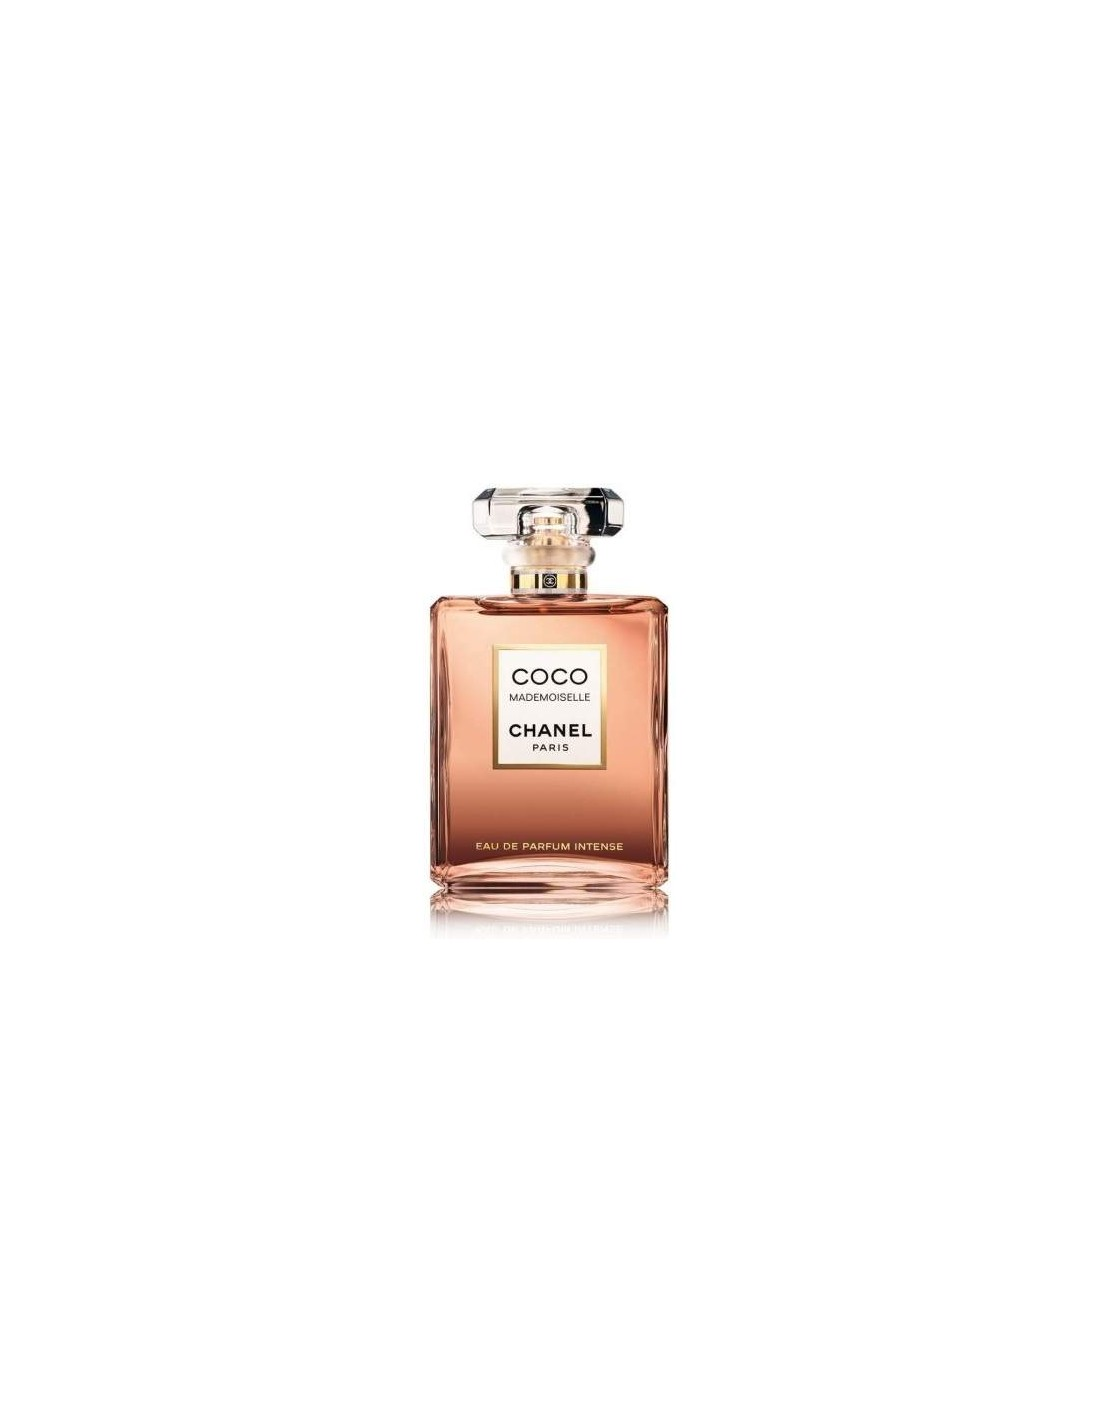 3bfac3adf خرید عطر ادکلن شنل کوکو مادمازل اینتنس Chanel Coco Mademoiselle Intense